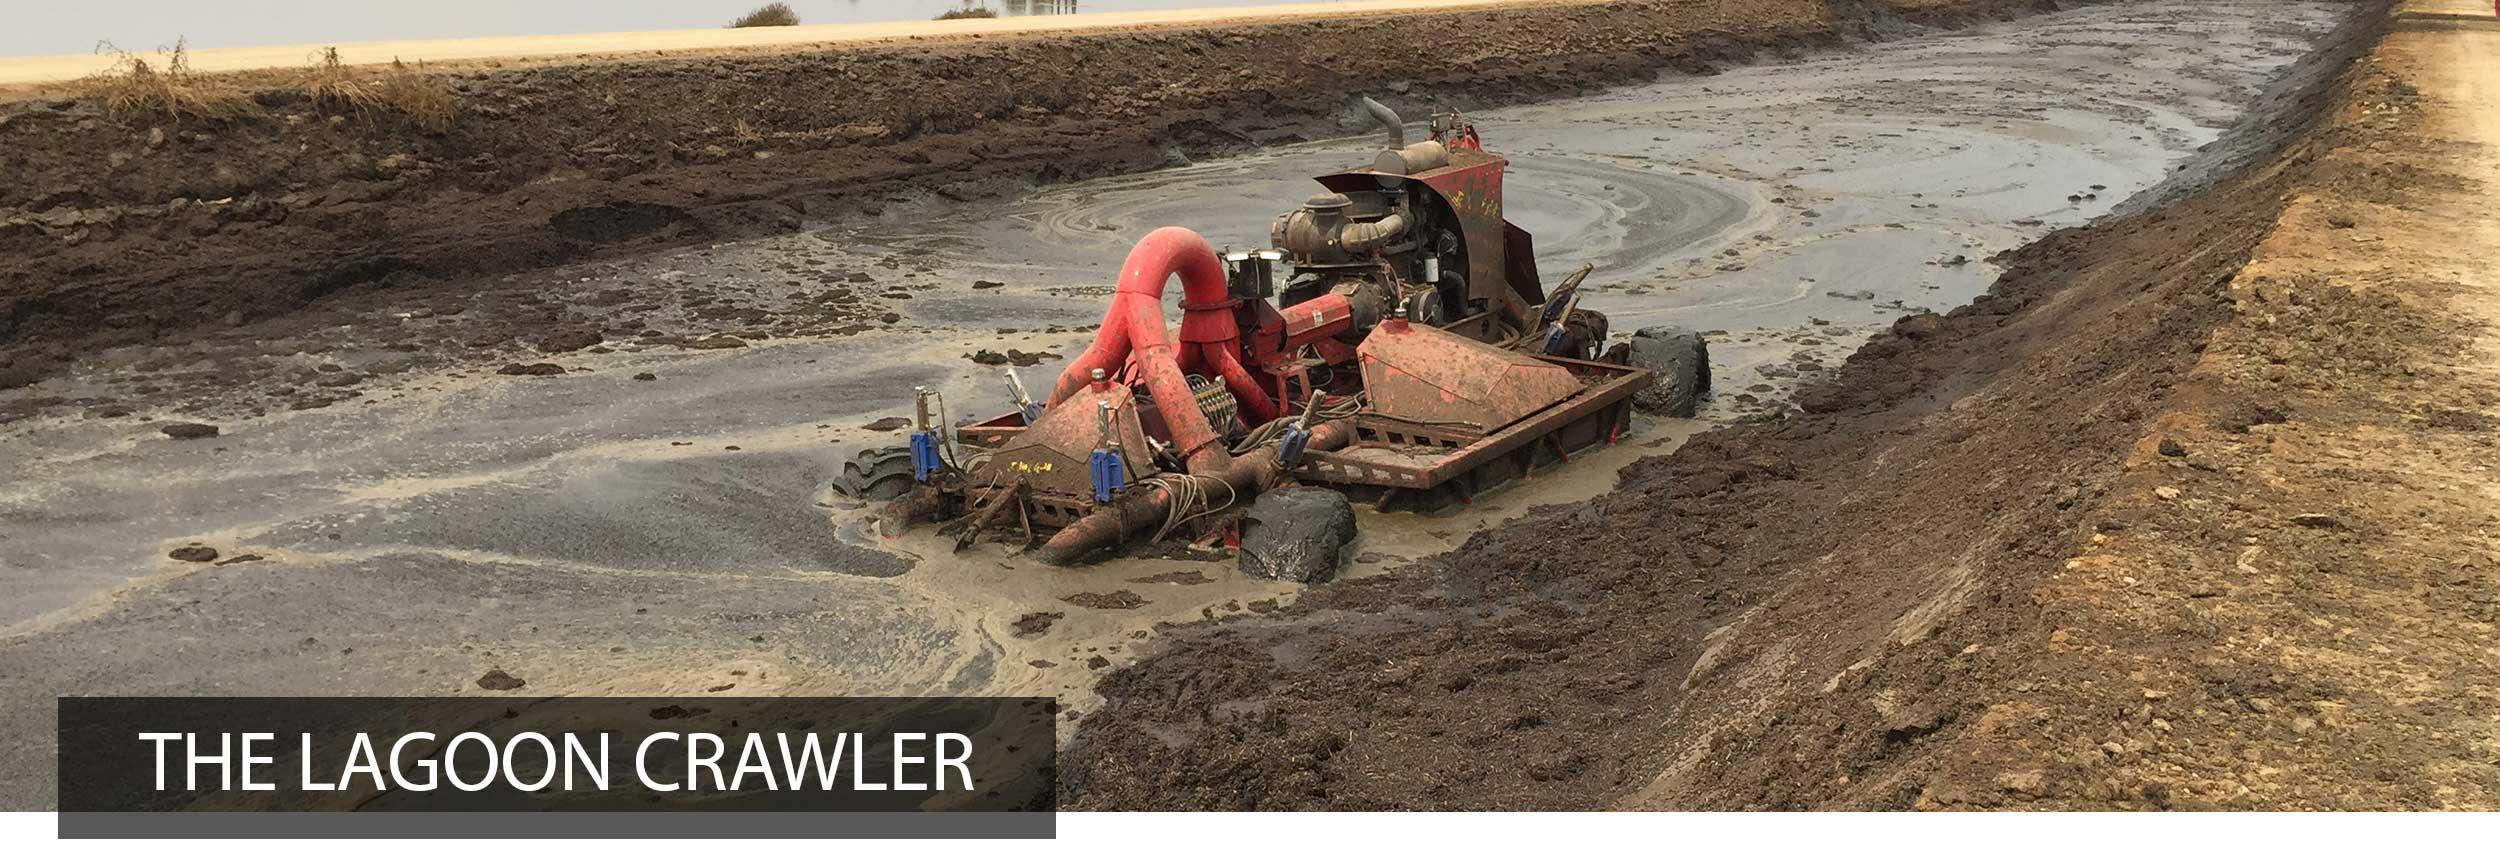 2018 Lagoon Crawler